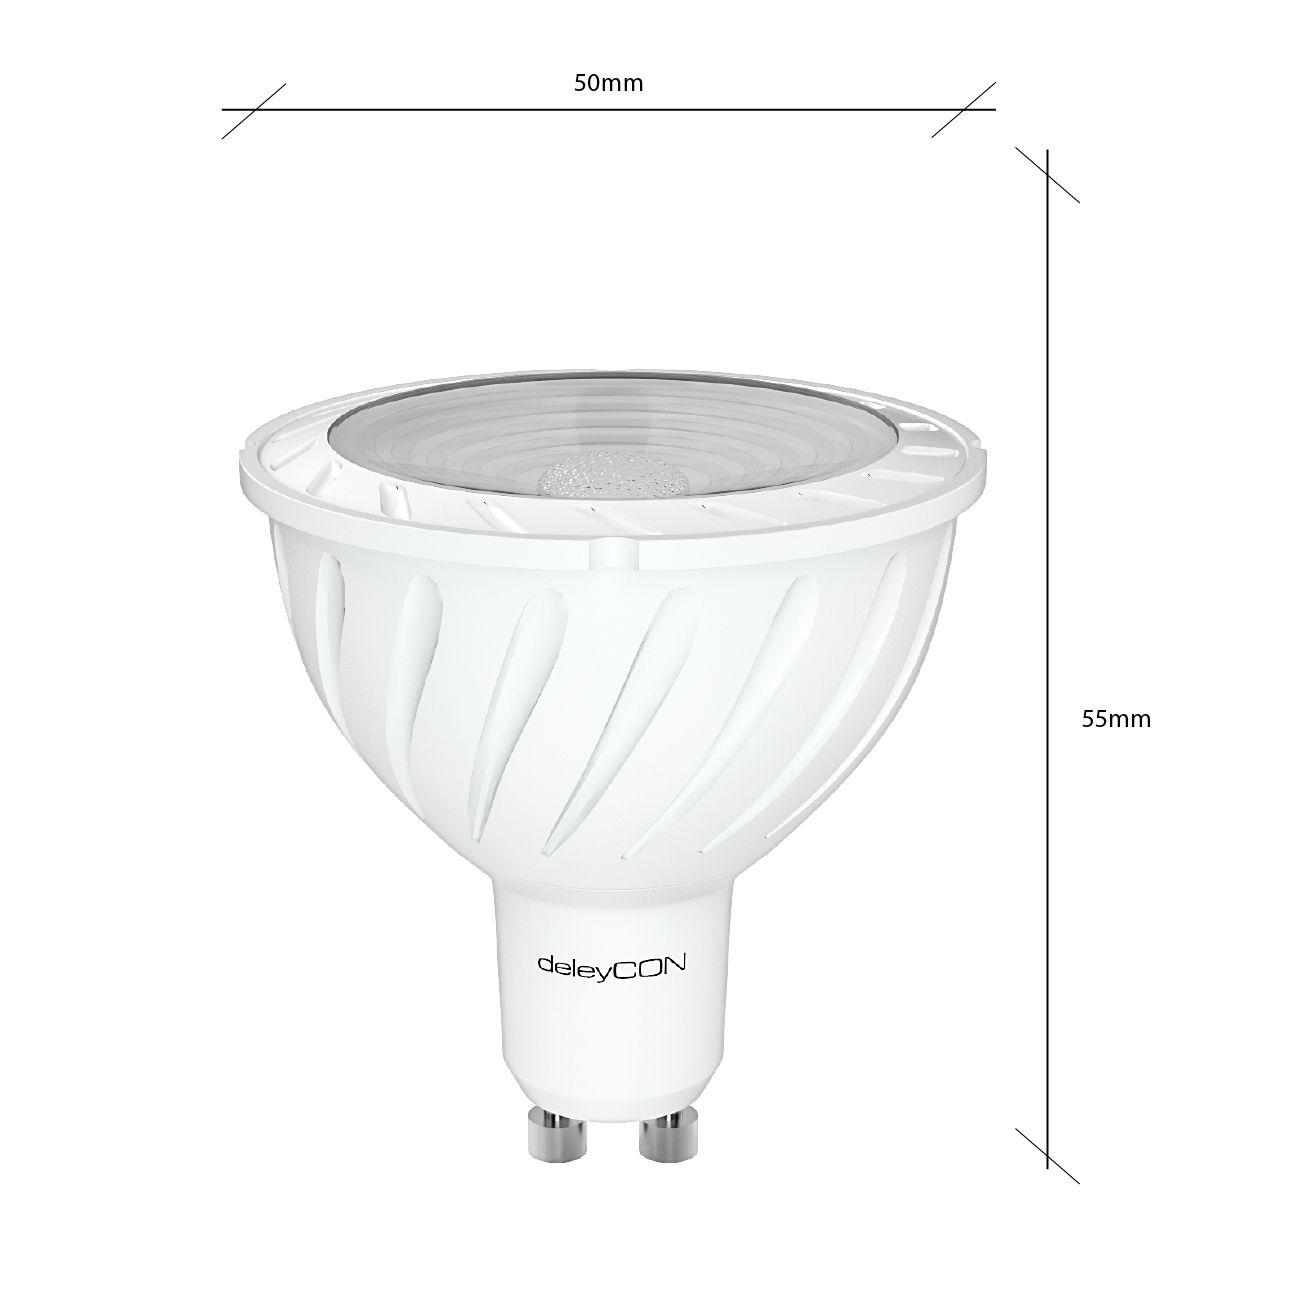 Deleycon led spot energiesparlampe fassung gu10 2700k warm deleycon led spot energiesparlampe fassung gu10 2700k warm wei leistung 6w parisarafo Gallery